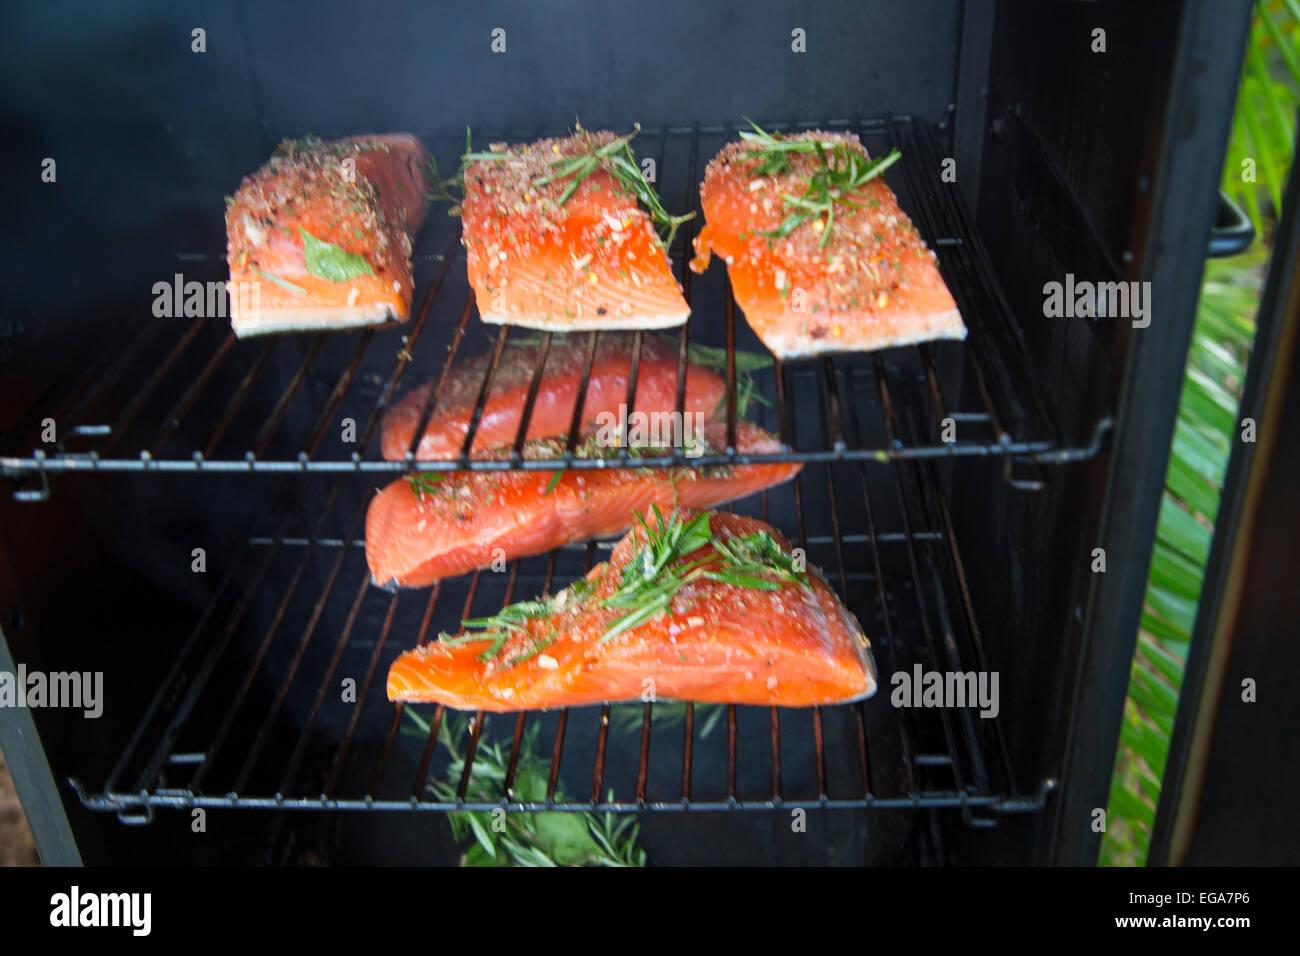 King Salmon in a smoker - Stock Image